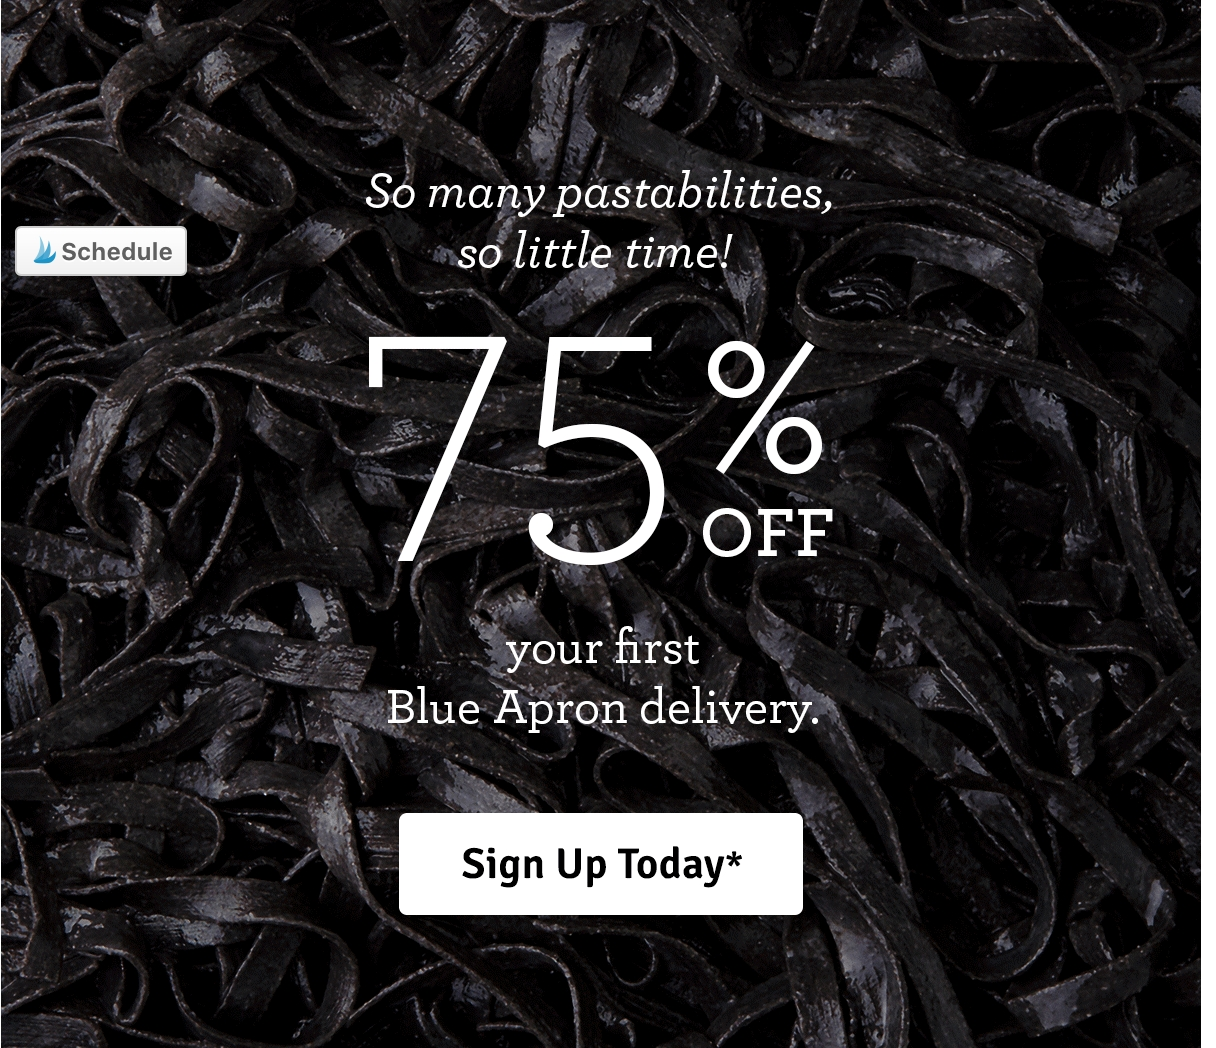 Blue apron coupons 2019